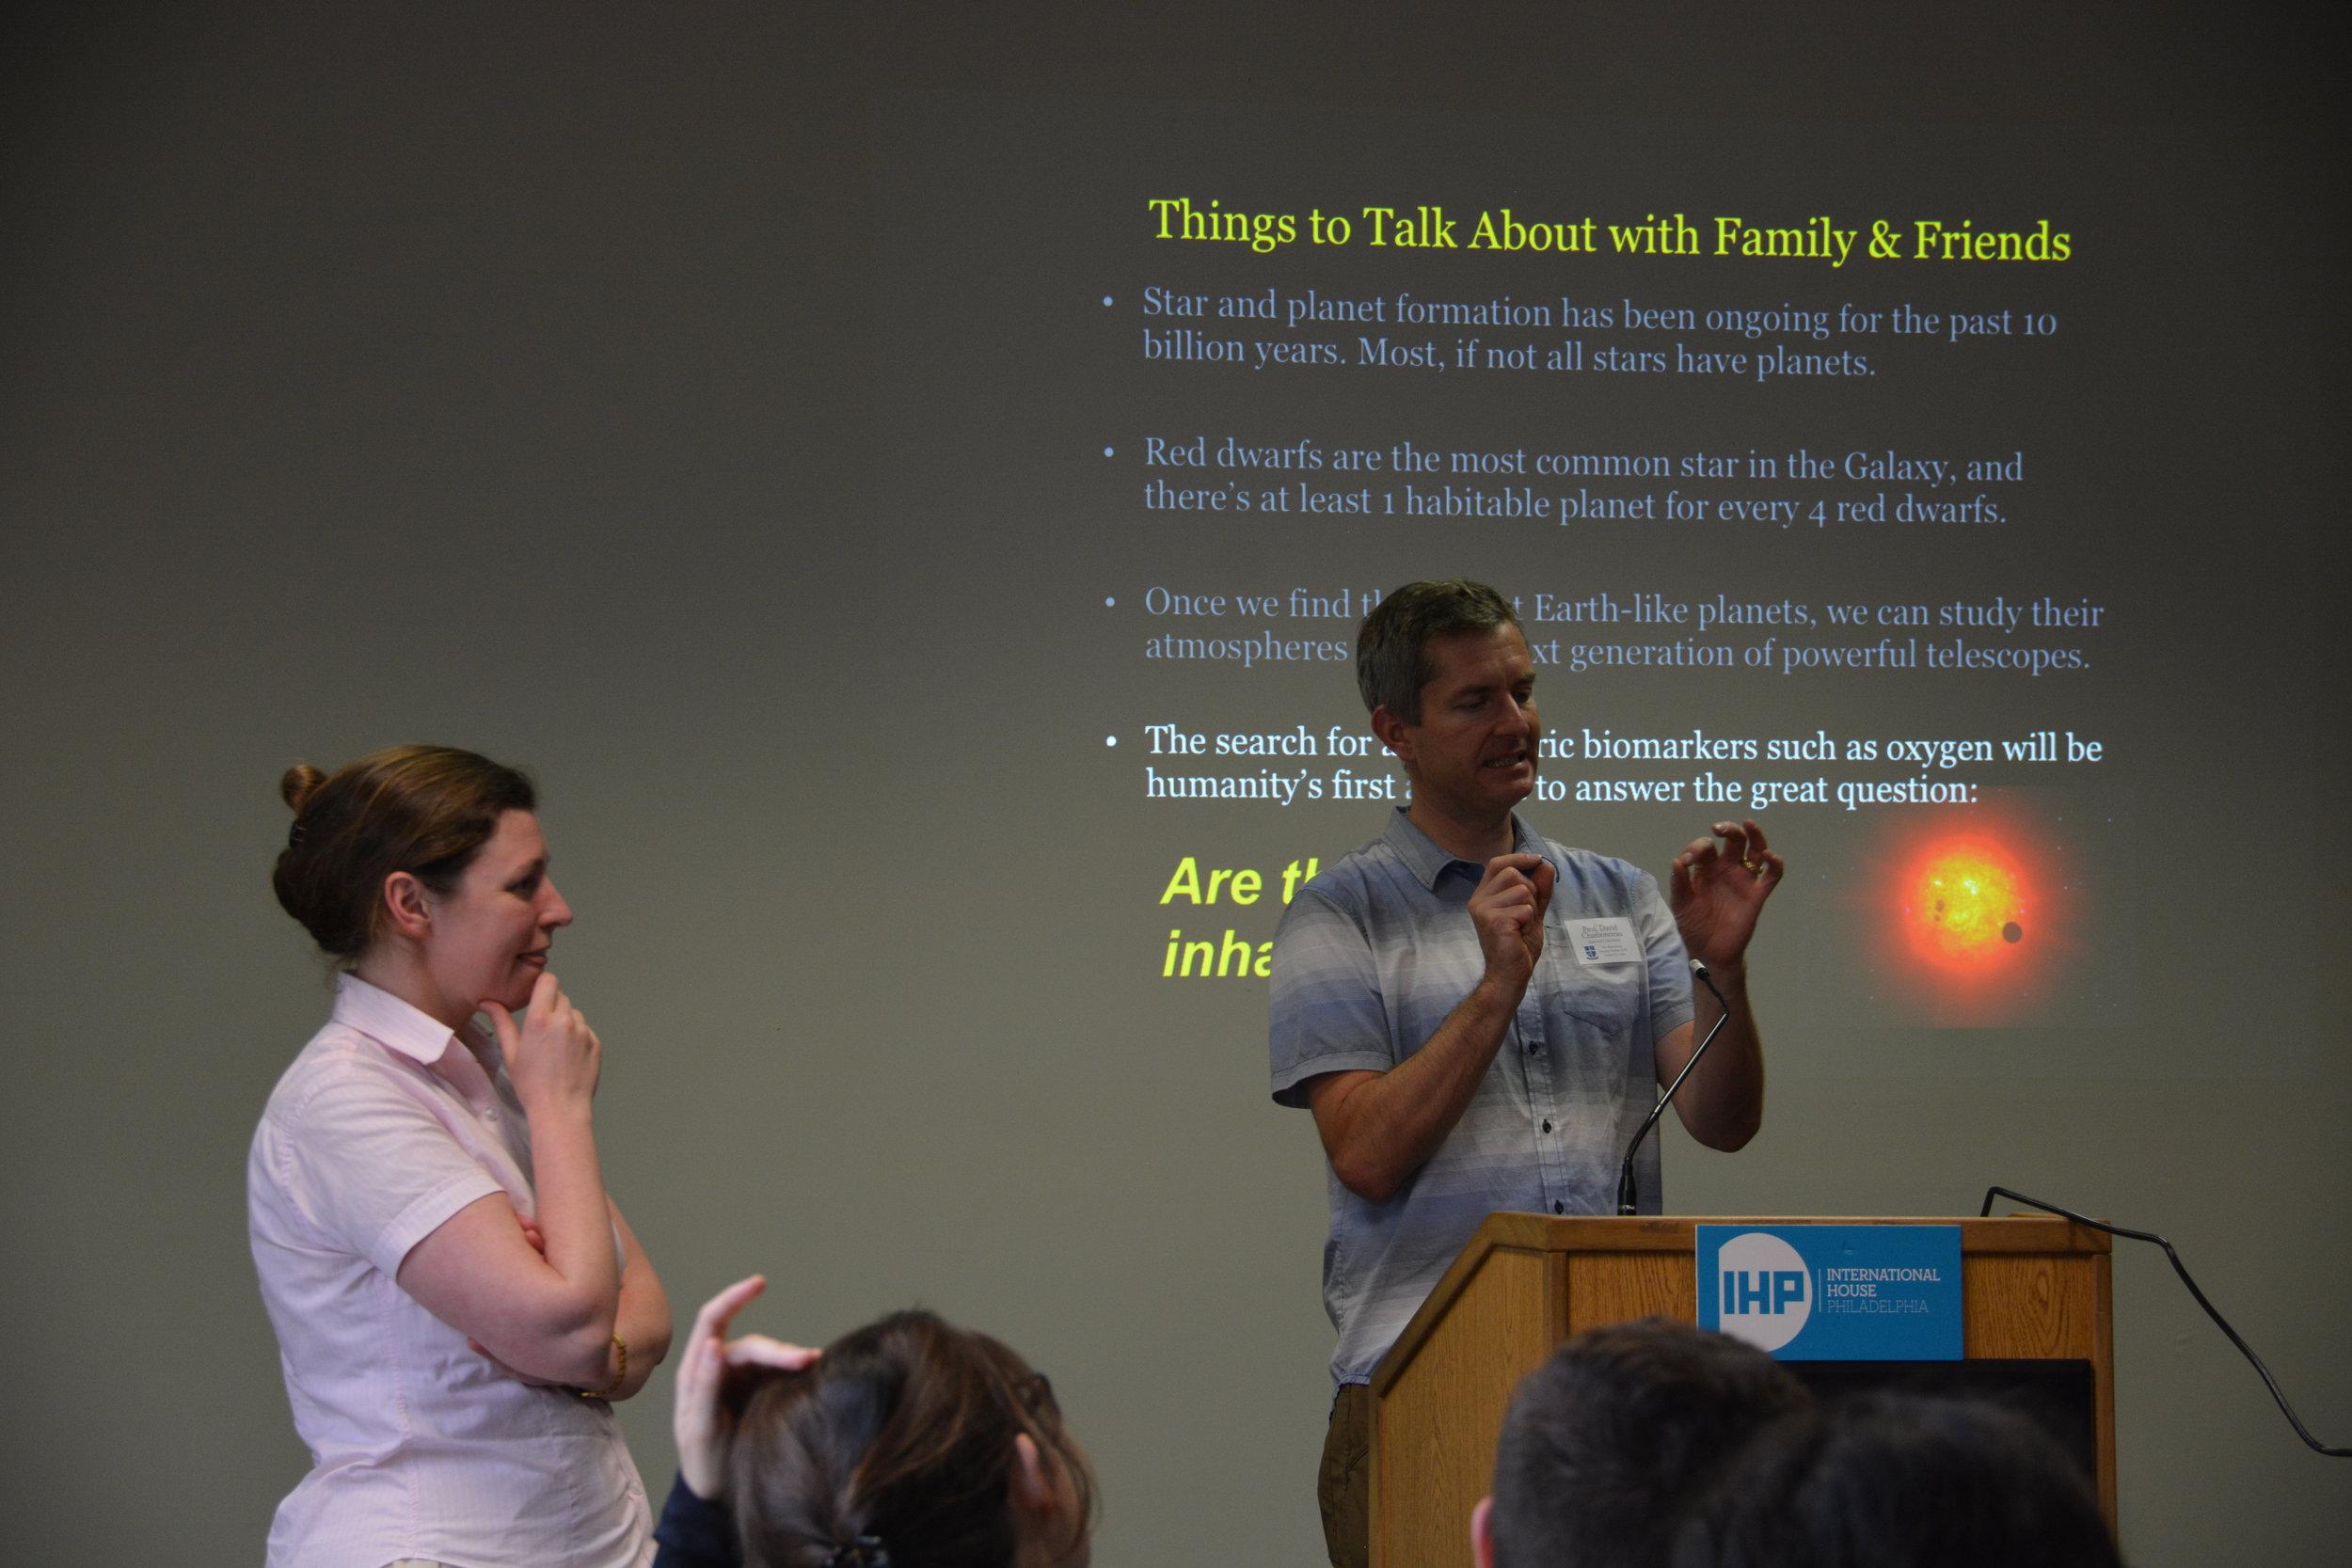 Professor David Charbonneau's talk on Exoplanets at Magi's 2018 summer seminar